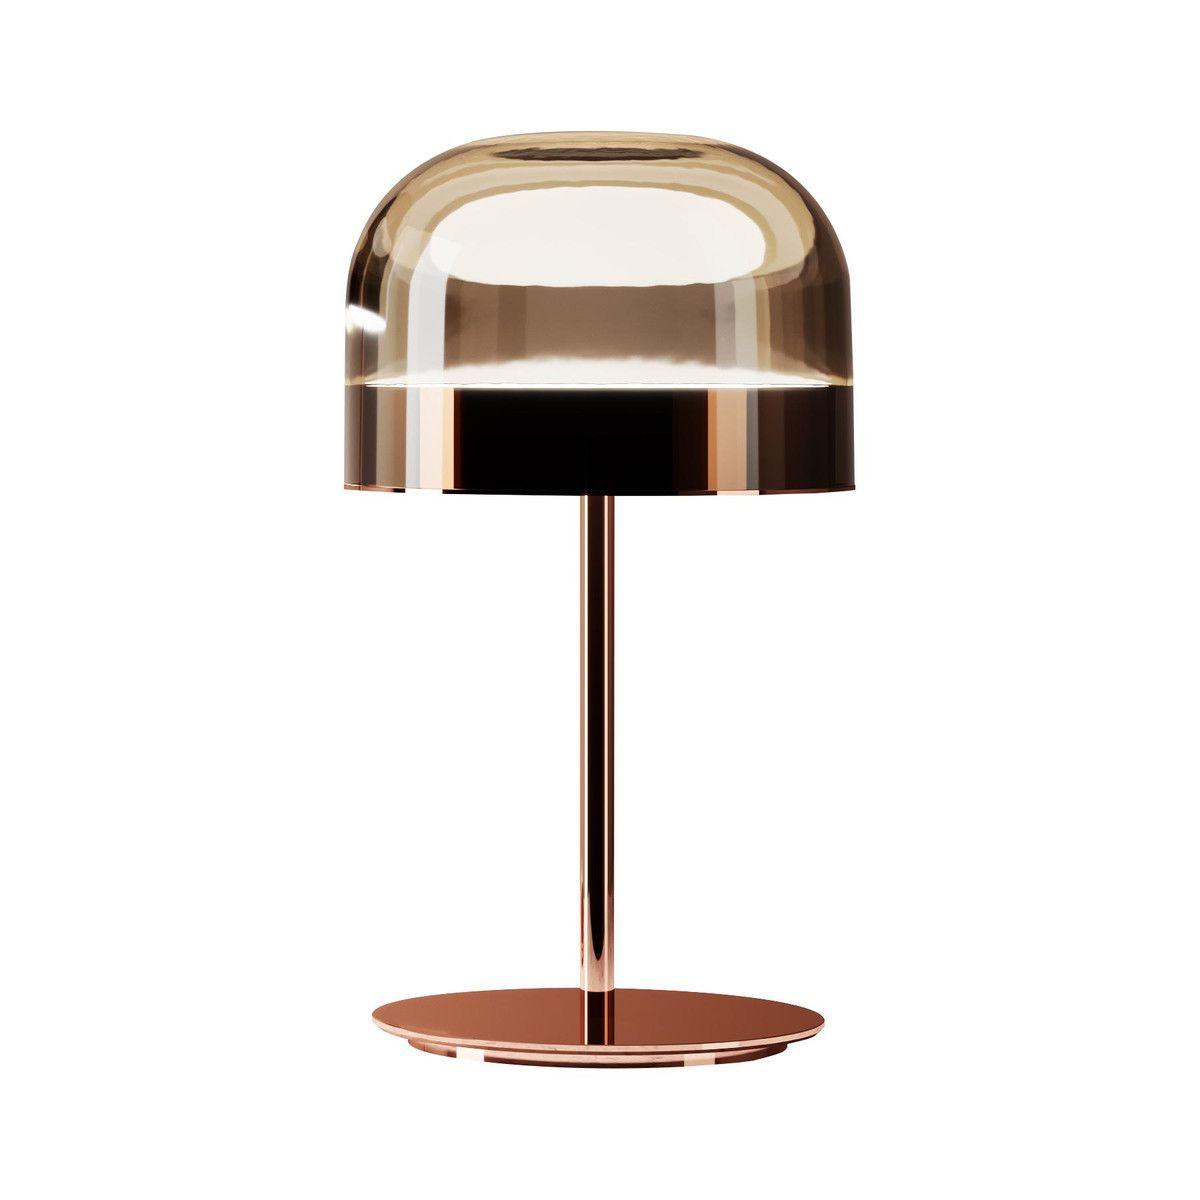 Equatore led lampara de mesa fontana arte - Lampara de mesa led ...